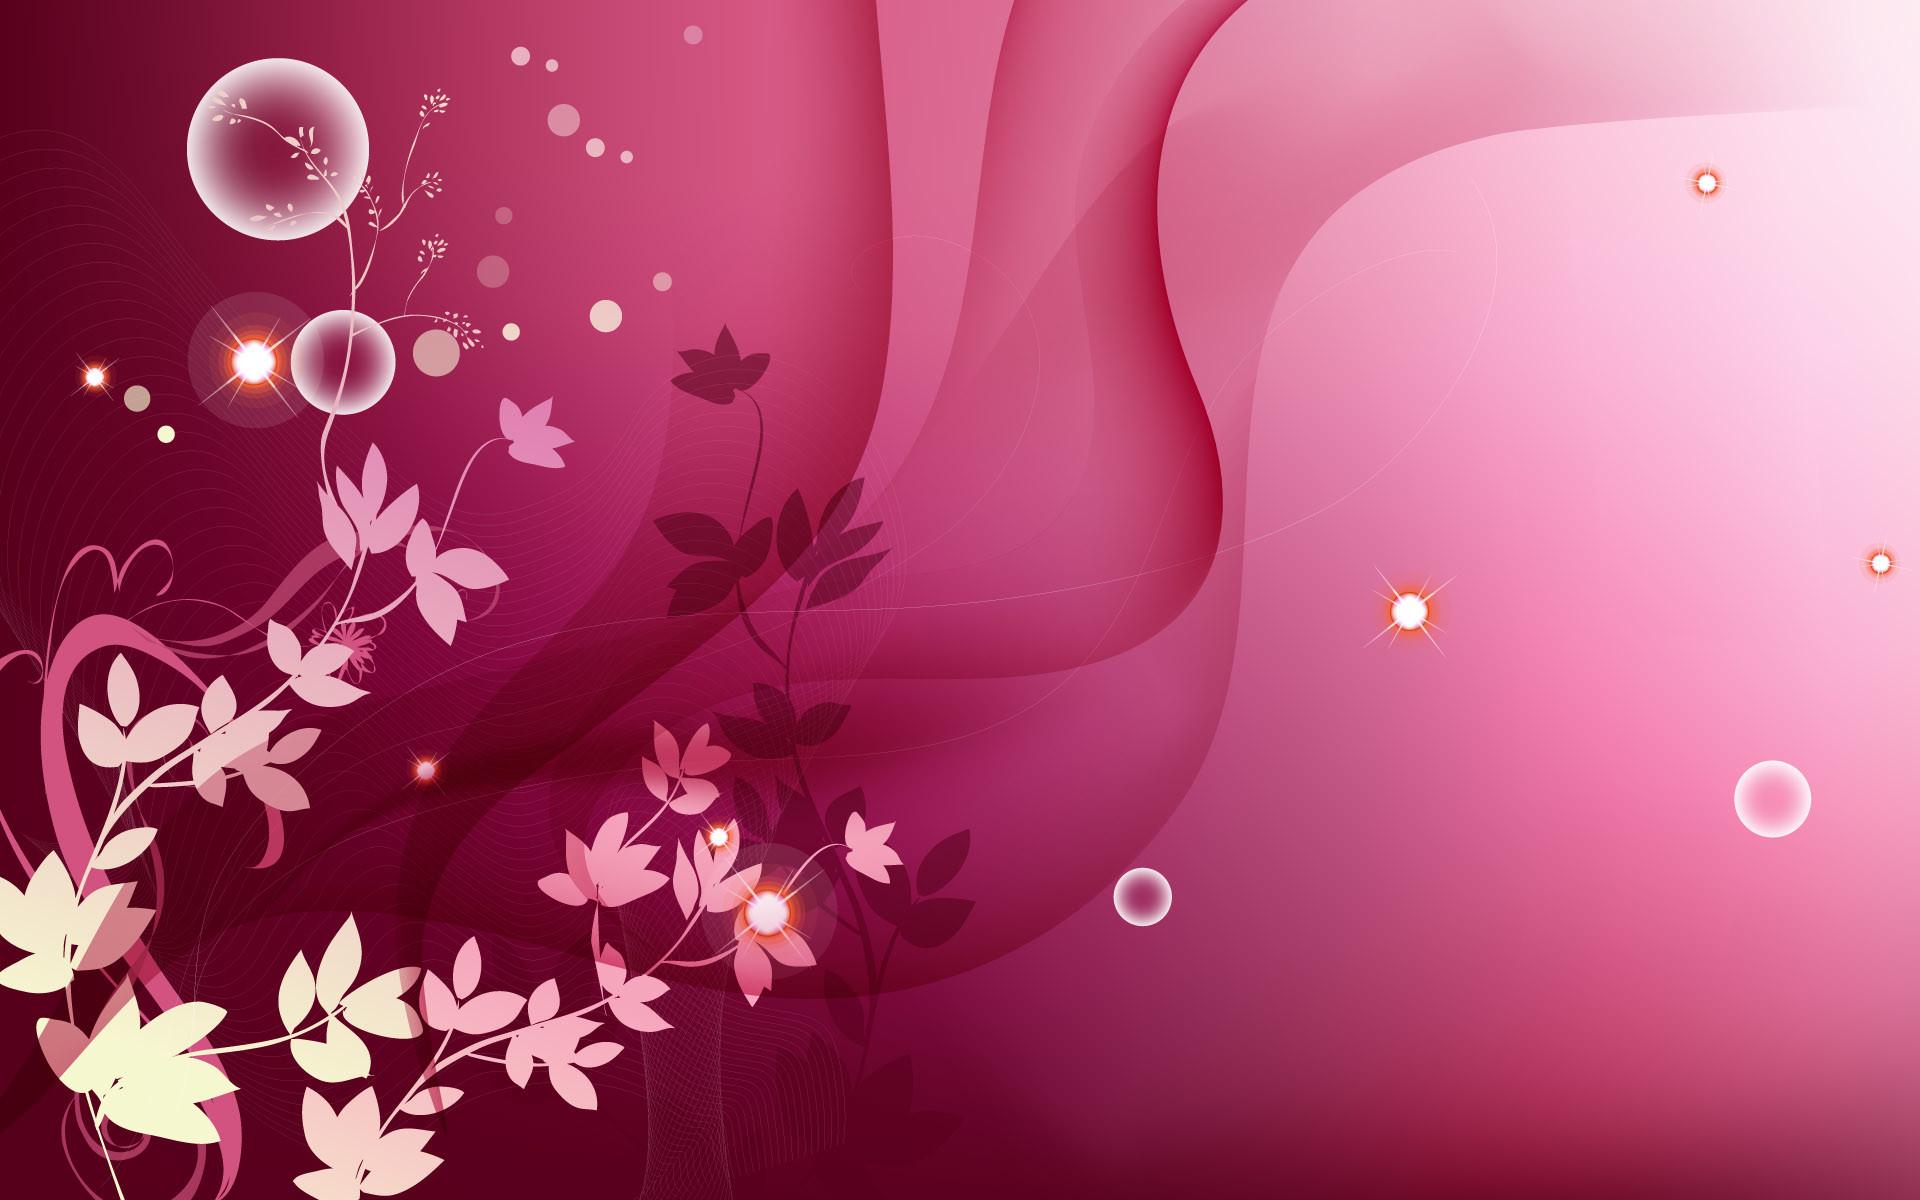 Pink flower wallpaper background 55 images 1920x1080 amusing pink and black flower wallpaper nice inspirational home decorating with pink and black flower wallpaper mightylinksfo